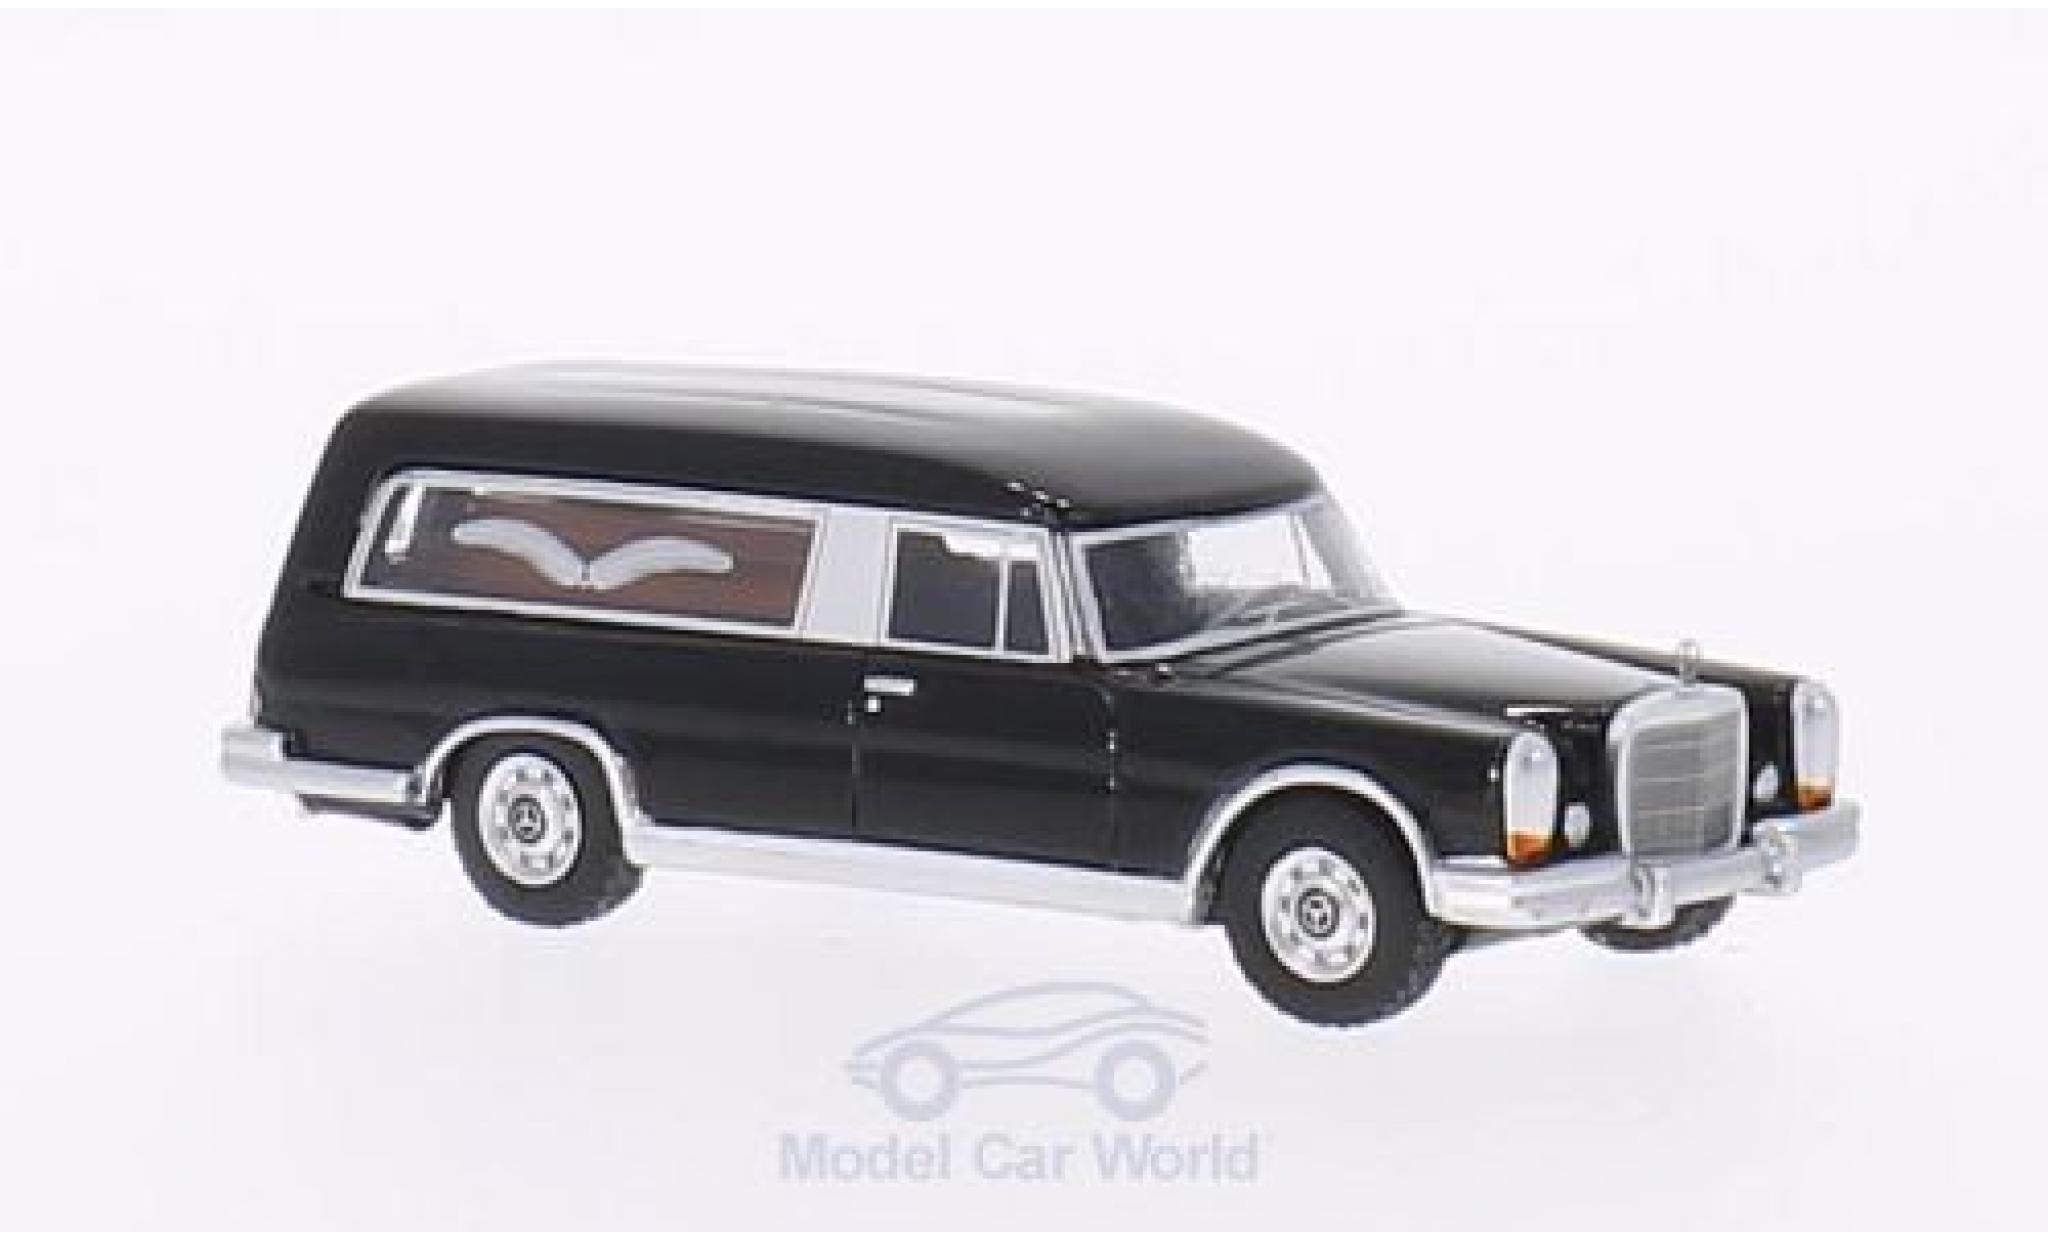 coche modelo 1:43//autocult Mercedes c111 Prototype 1969 blanco